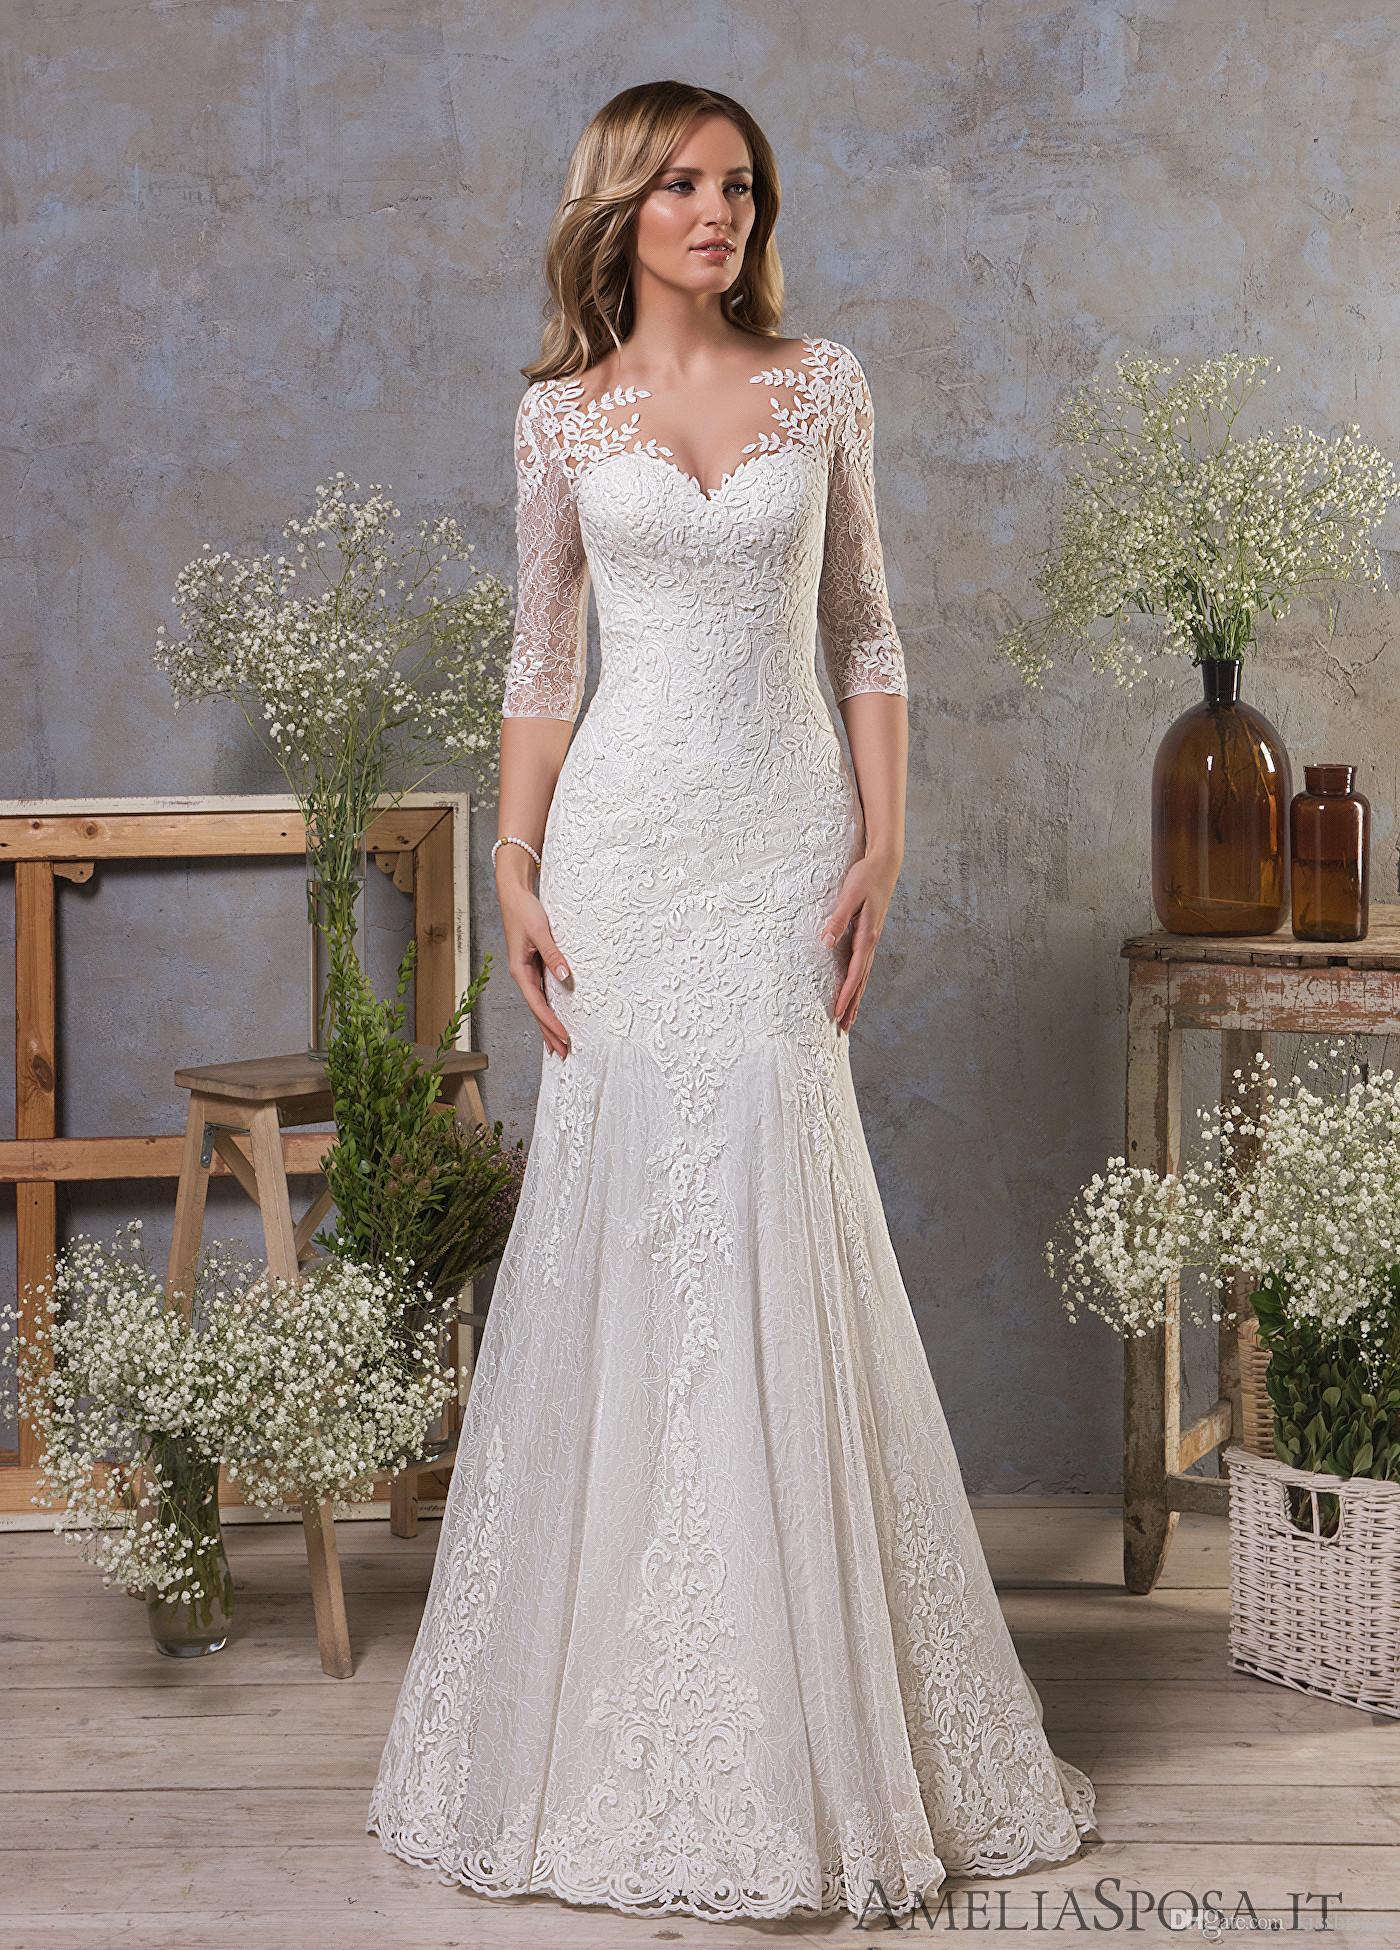 Abiti Da Sposa.Mermaid Lace Wedding Dresses Abiti Da Sposa Elegant Vestidos De